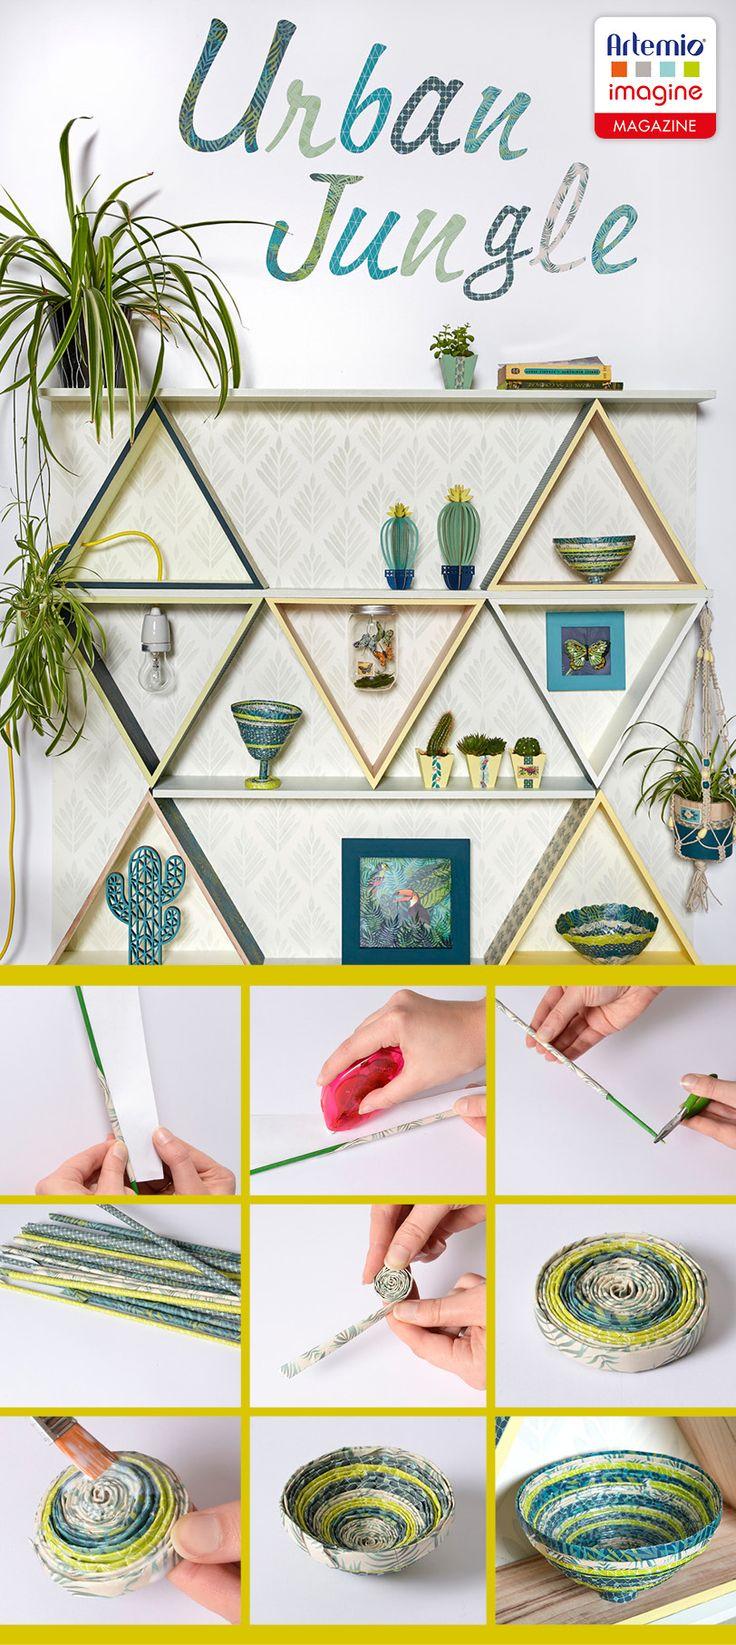 id es d co ambiance urban jungle application gratuite artemio imagine apple andro d deco. Black Bedroom Furniture Sets. Home Design Ideas